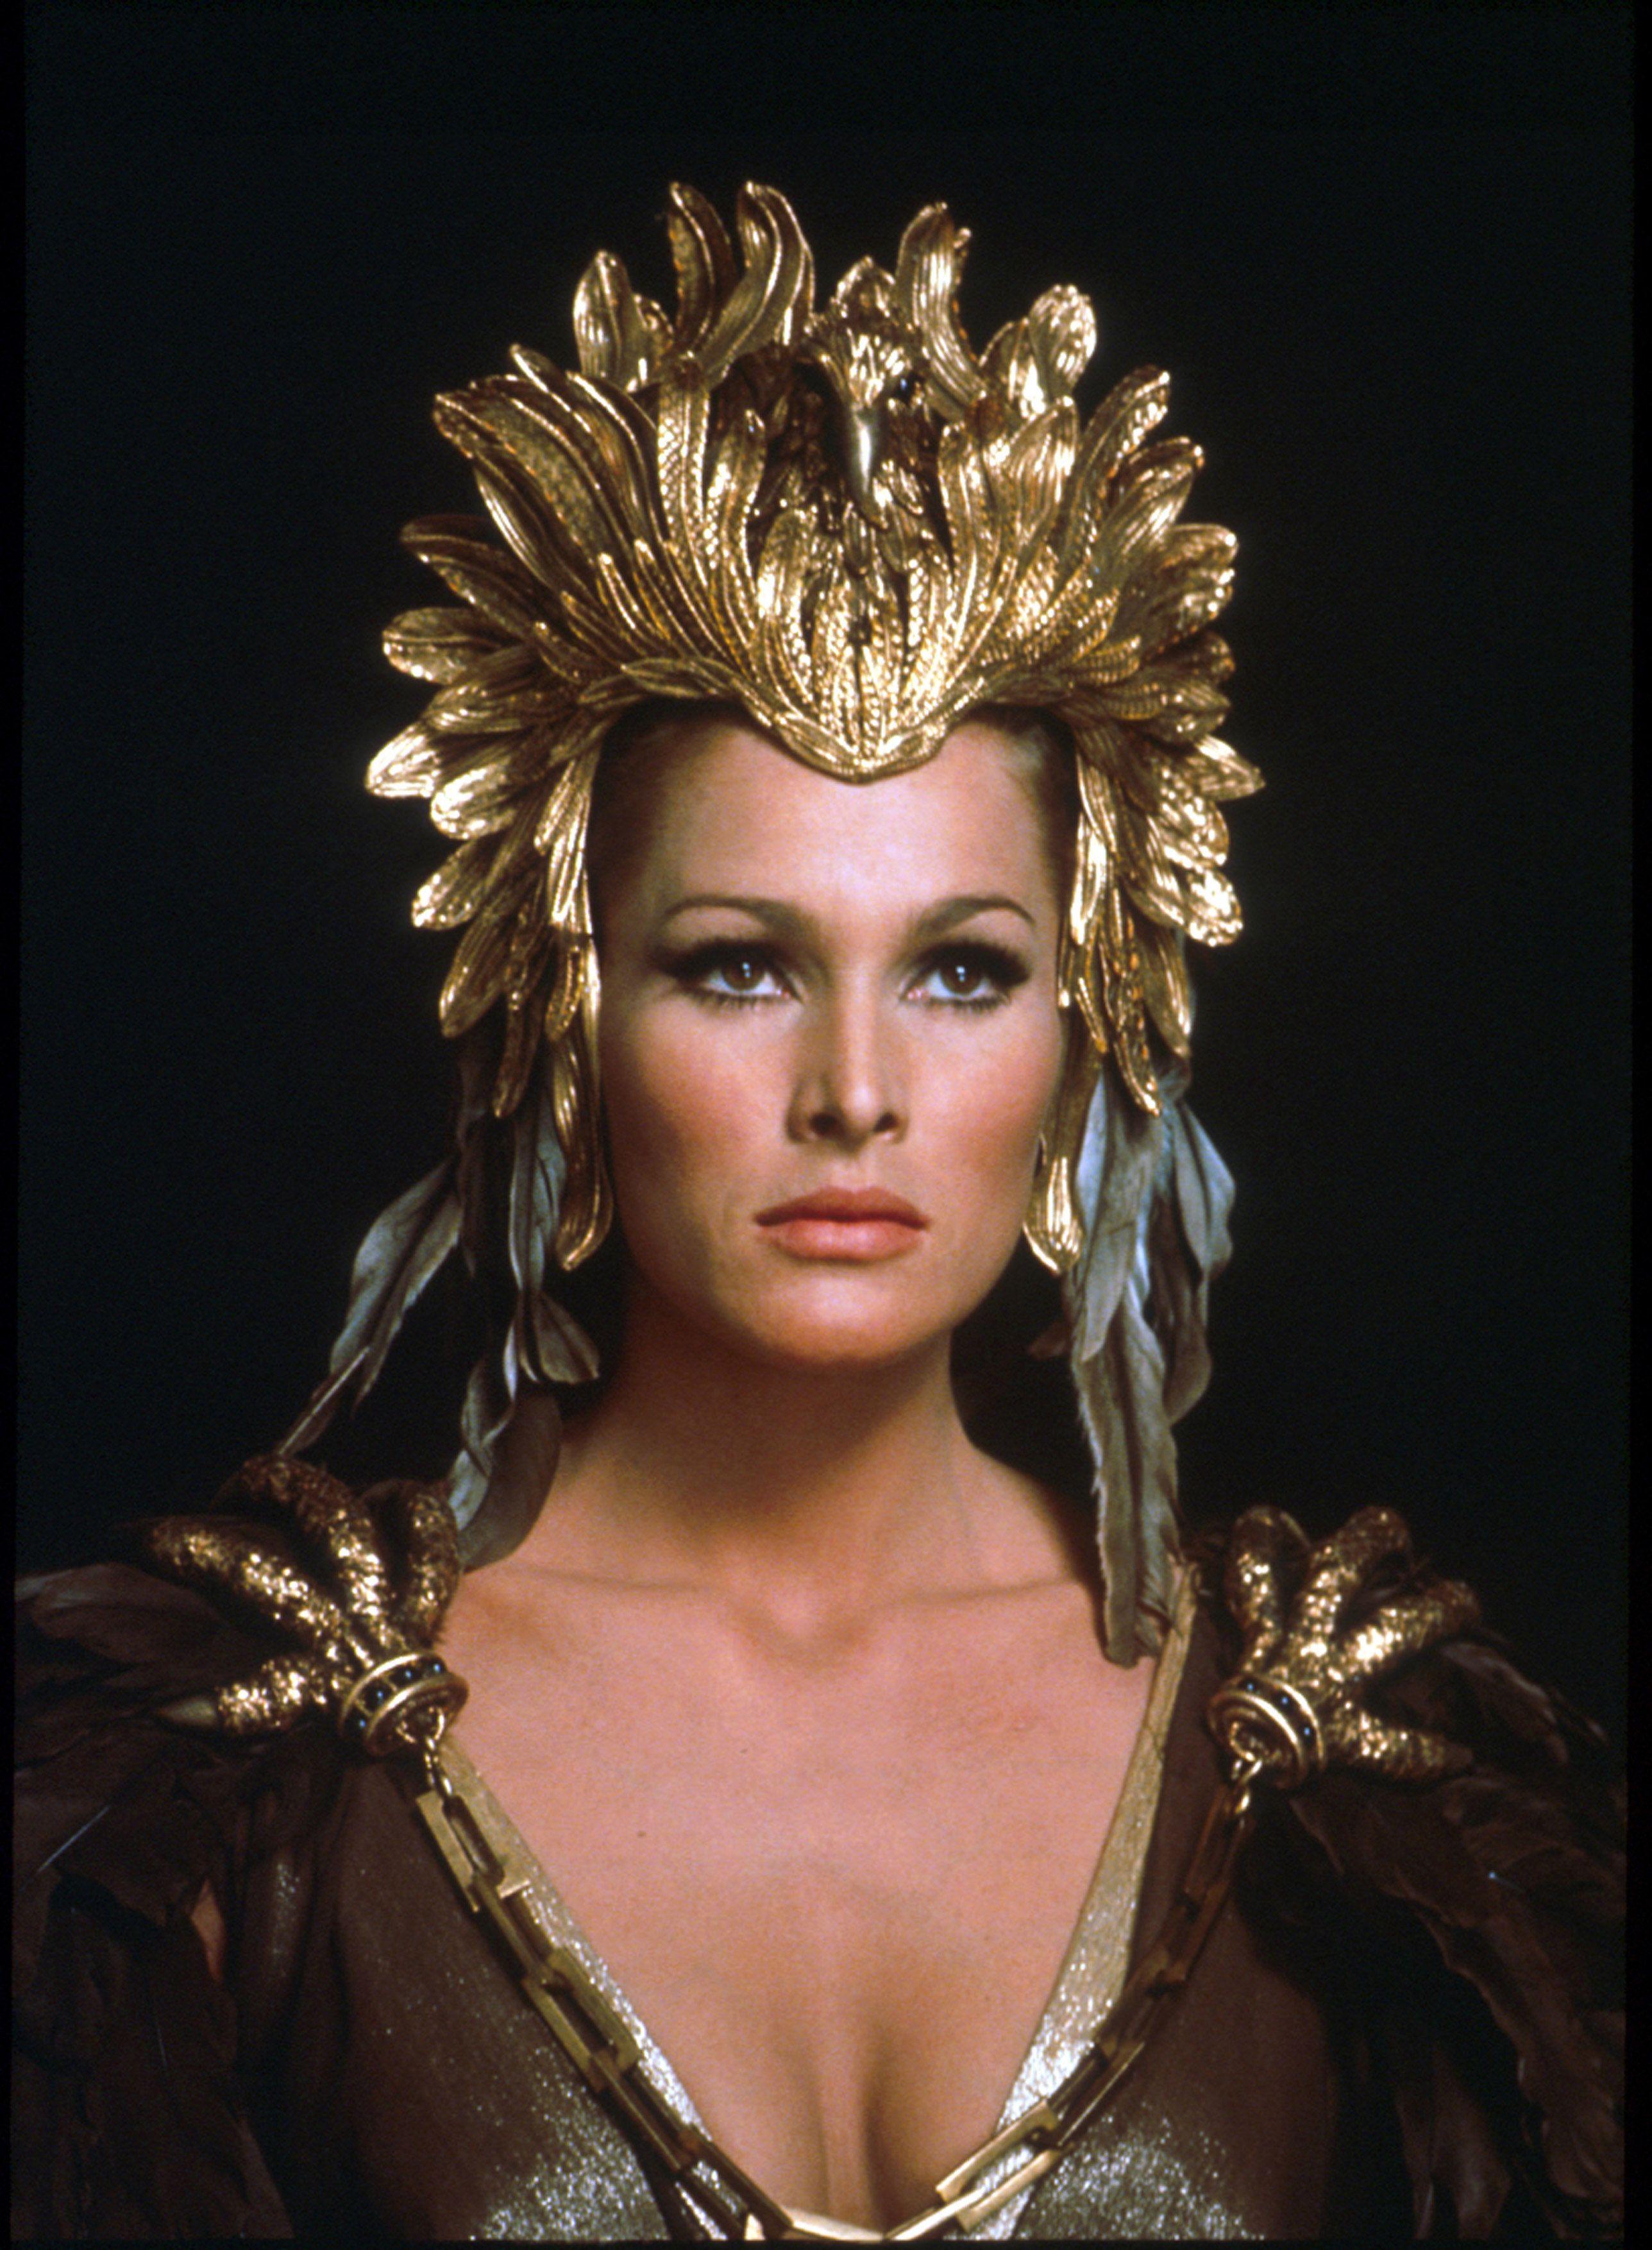 She (MGM, 1965). Screen Capture | Ursula andress, Ursula, Robert day